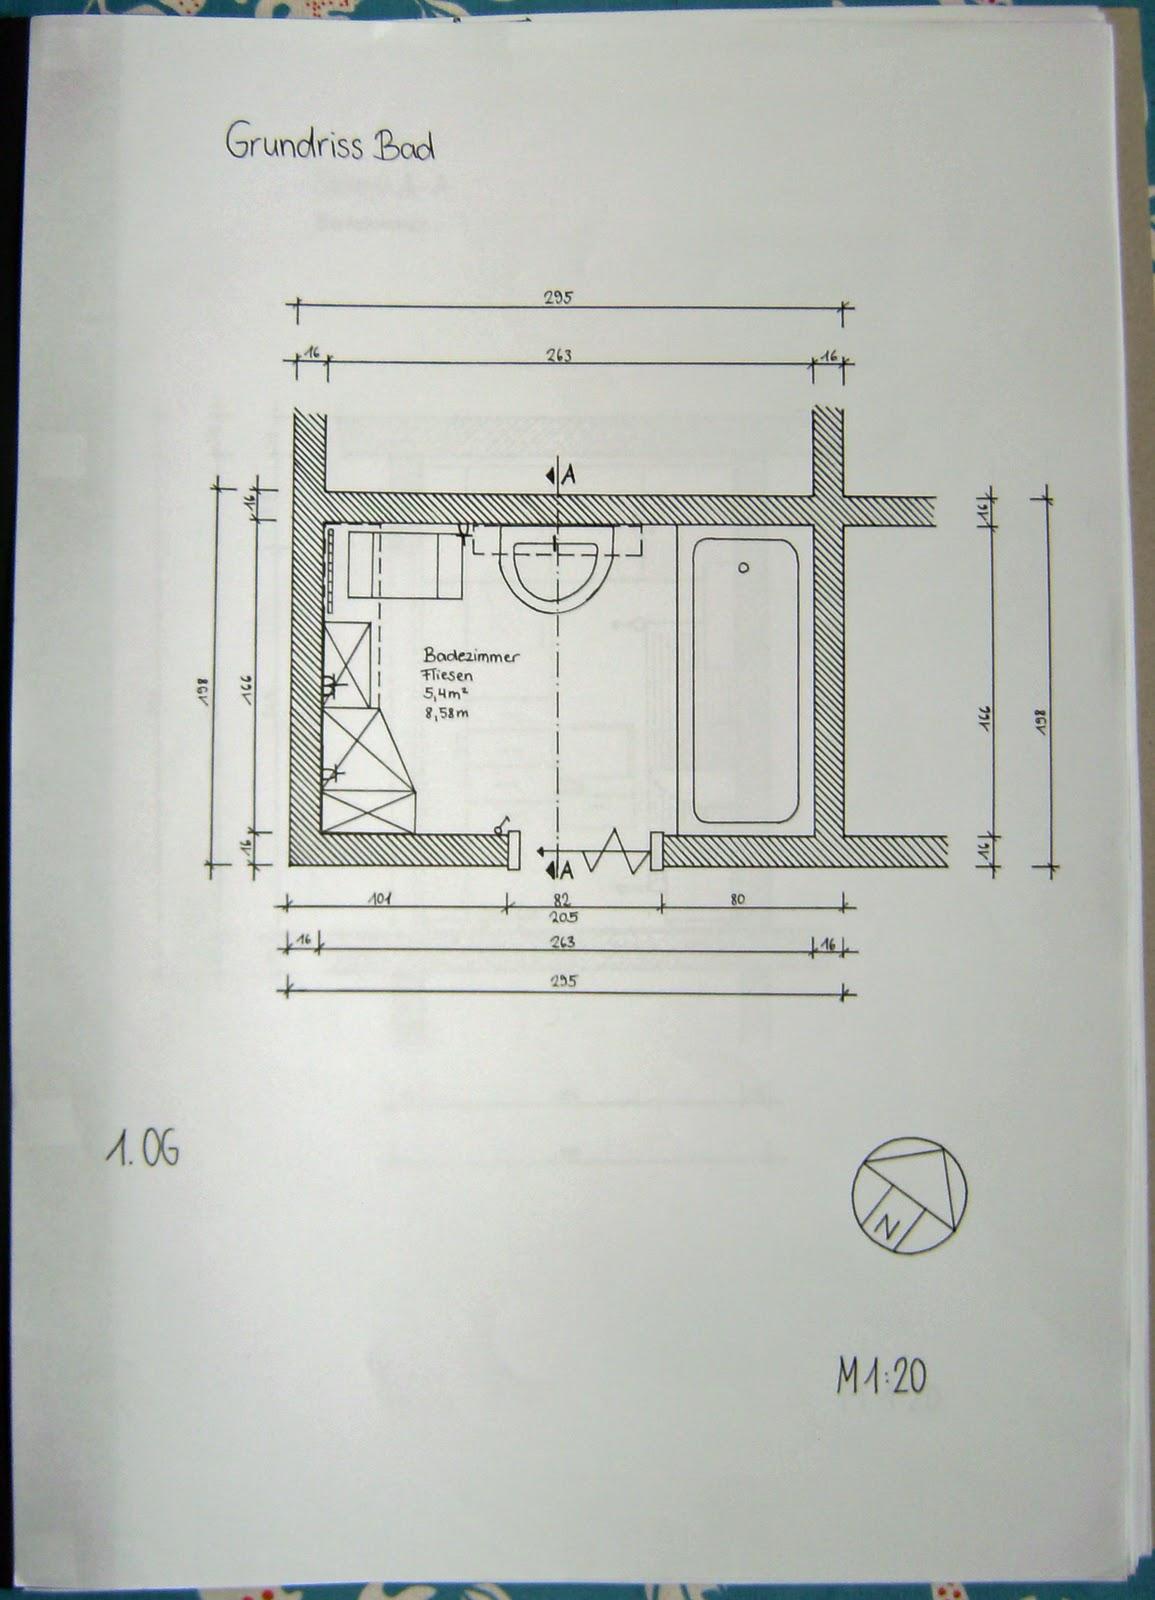 grundriss bad badezimmer grundriss beispiele din bad wc badplanung with grundriss bad trendy. Black Bedroom Furniture Sets. Home Design Ideas